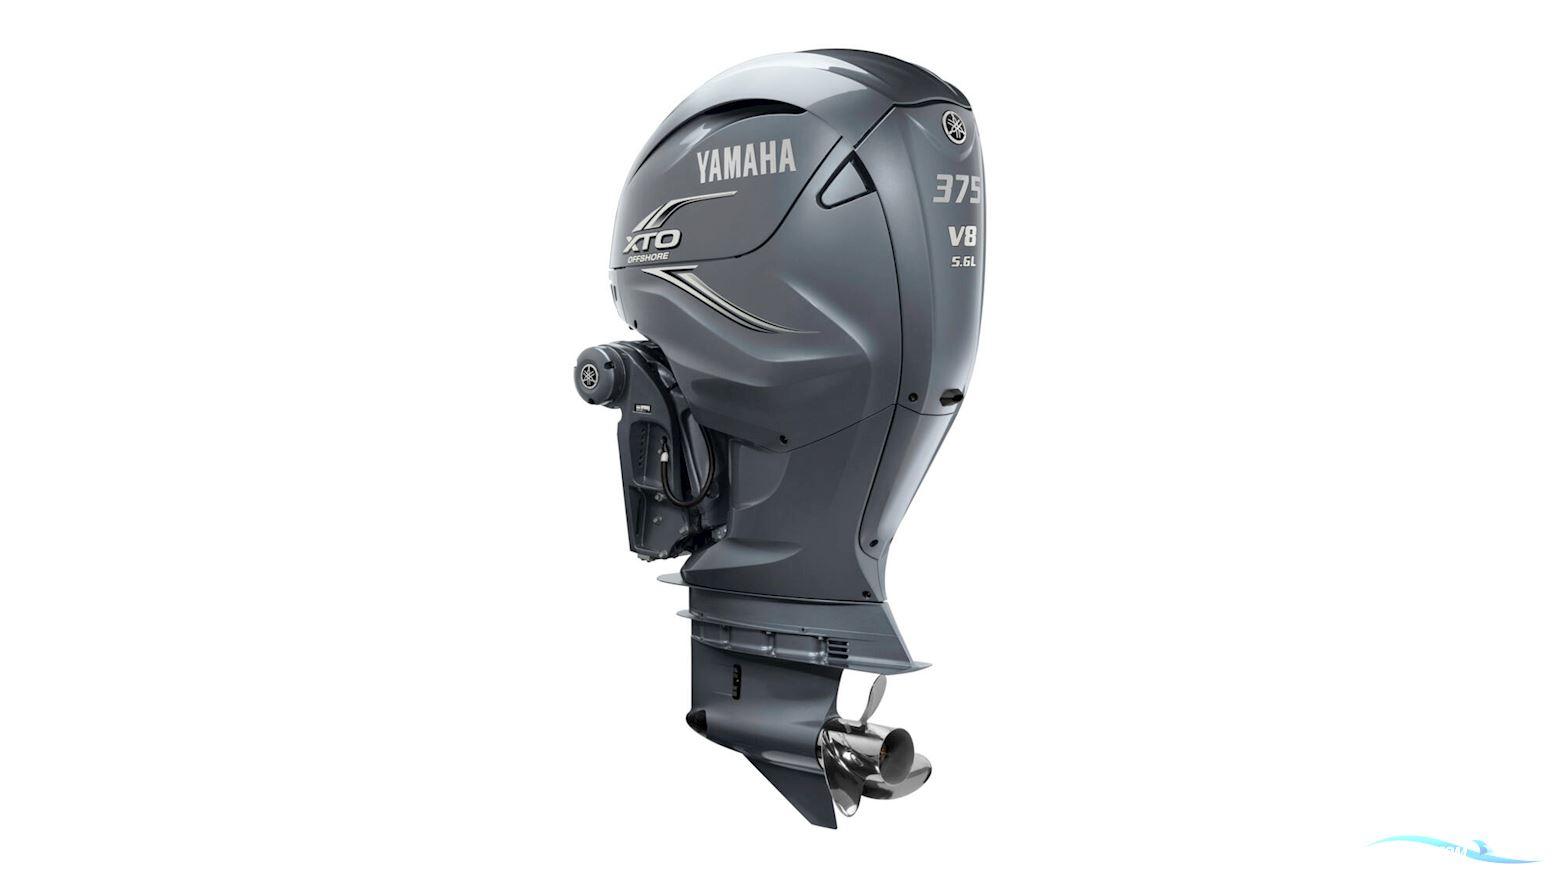 Yamaha FX375 Xto